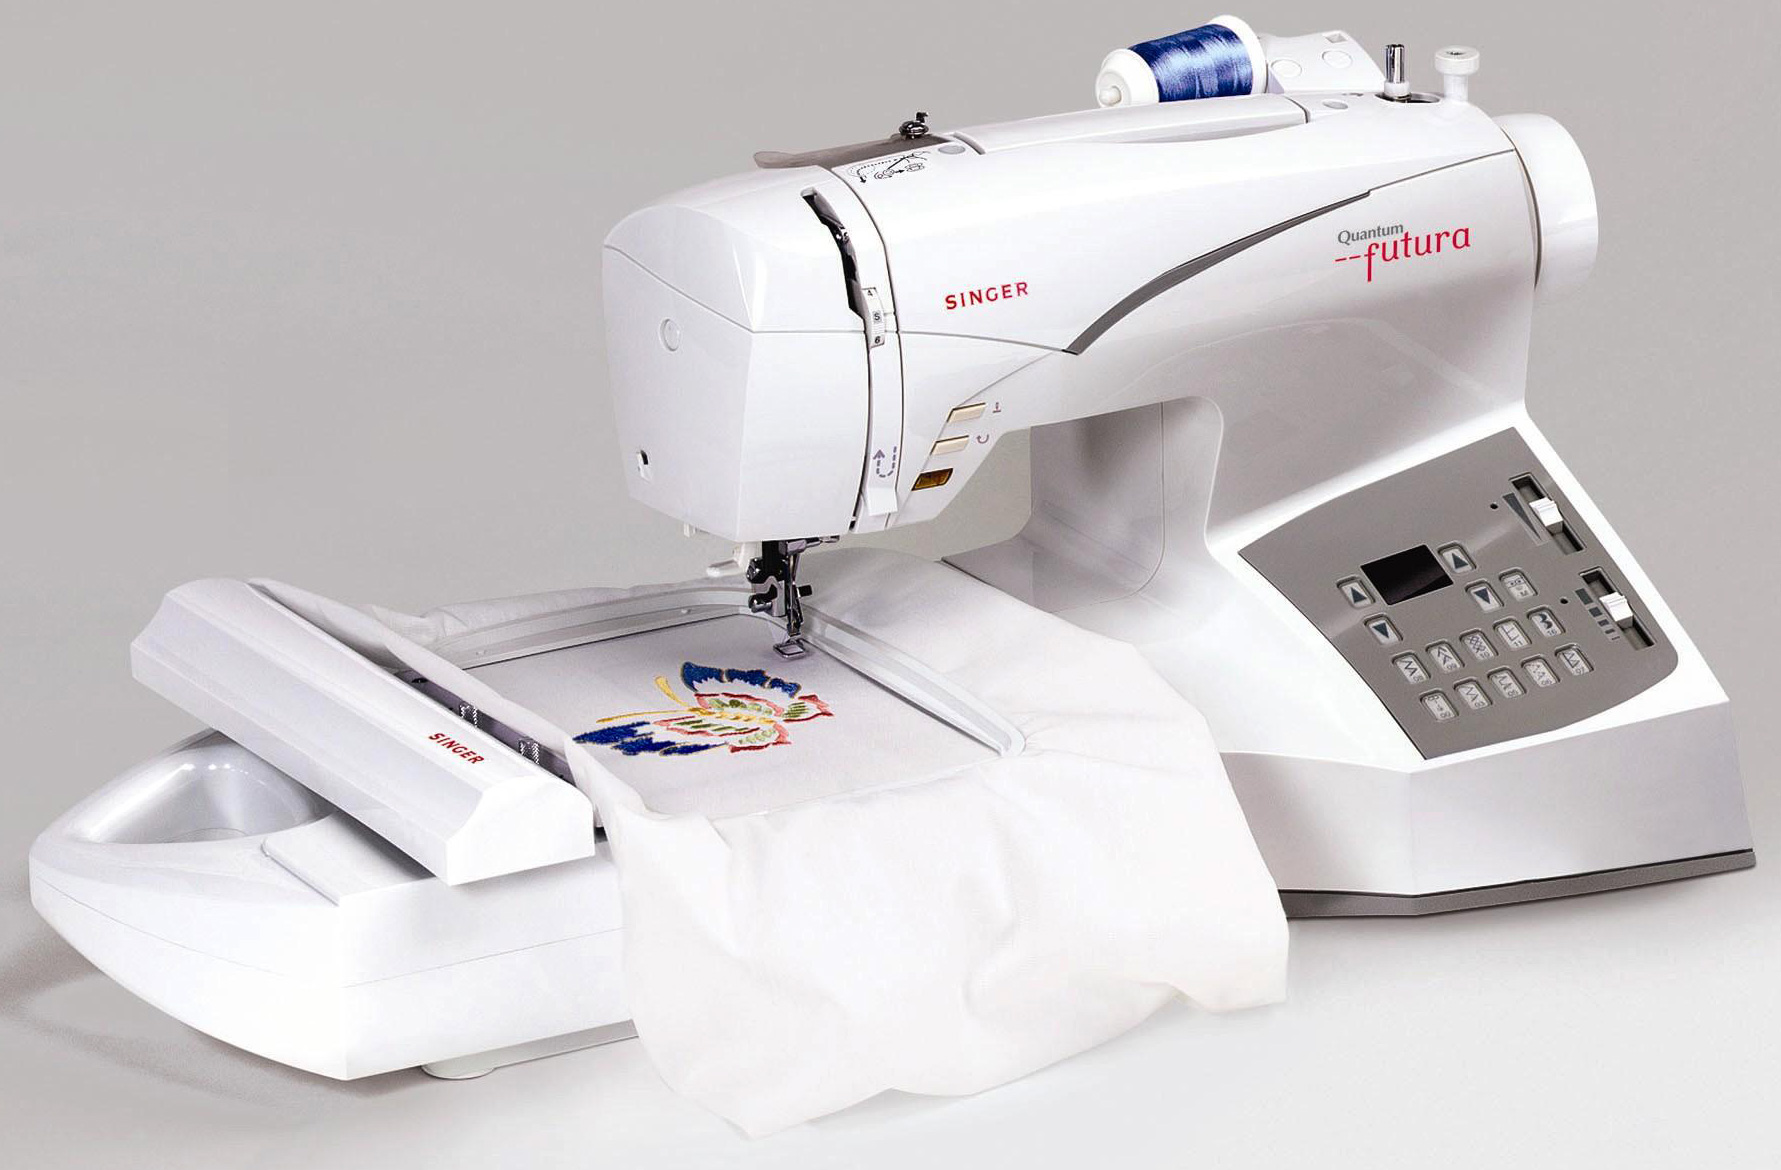 singer quantum futura ce 200 embroidery sewing machine fs w 3900 rh sewingmachinesplus com Quick Reference Guide Online User Guide